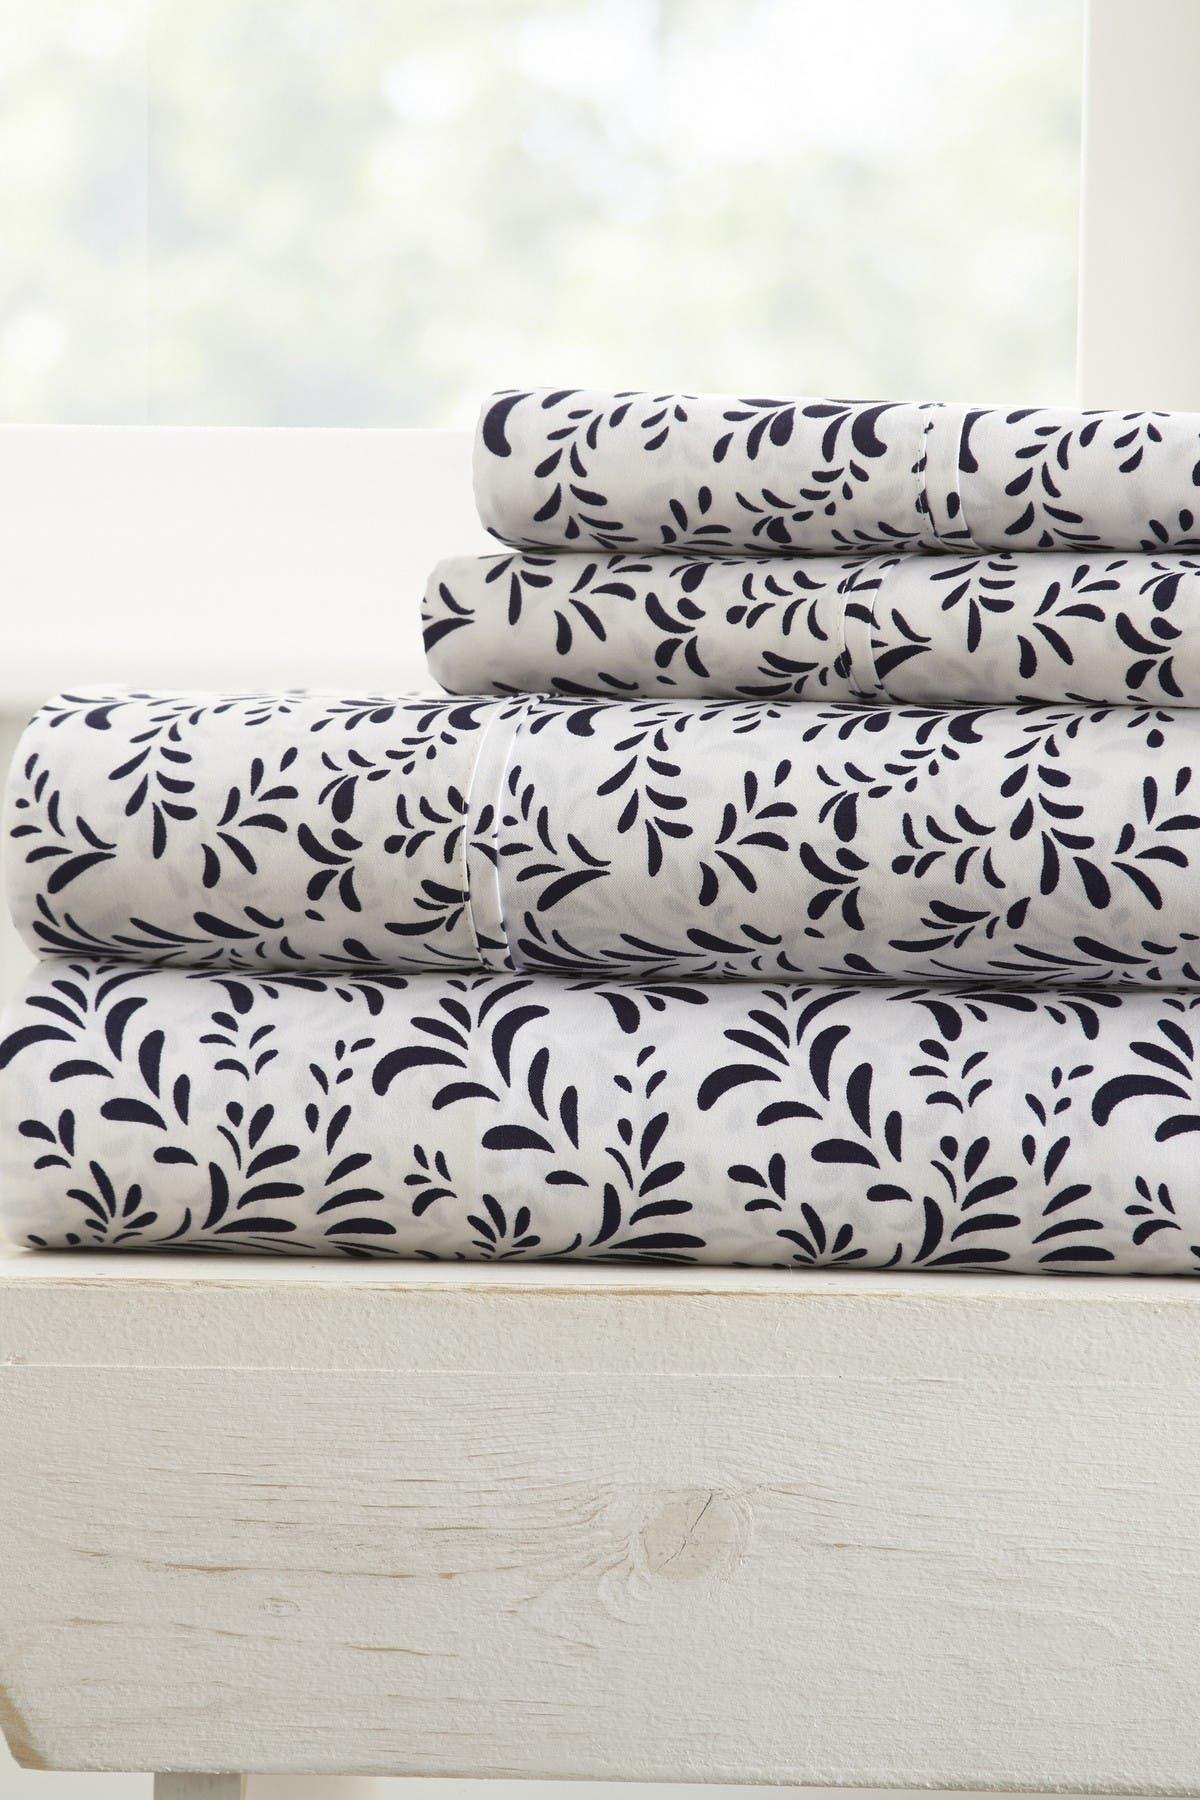 IENJOY HOME Home Spun Premium Ultra Burst of Vines Pattern 4-Piece California King Bed Sheet Set - Navy at Nordstrom Rack